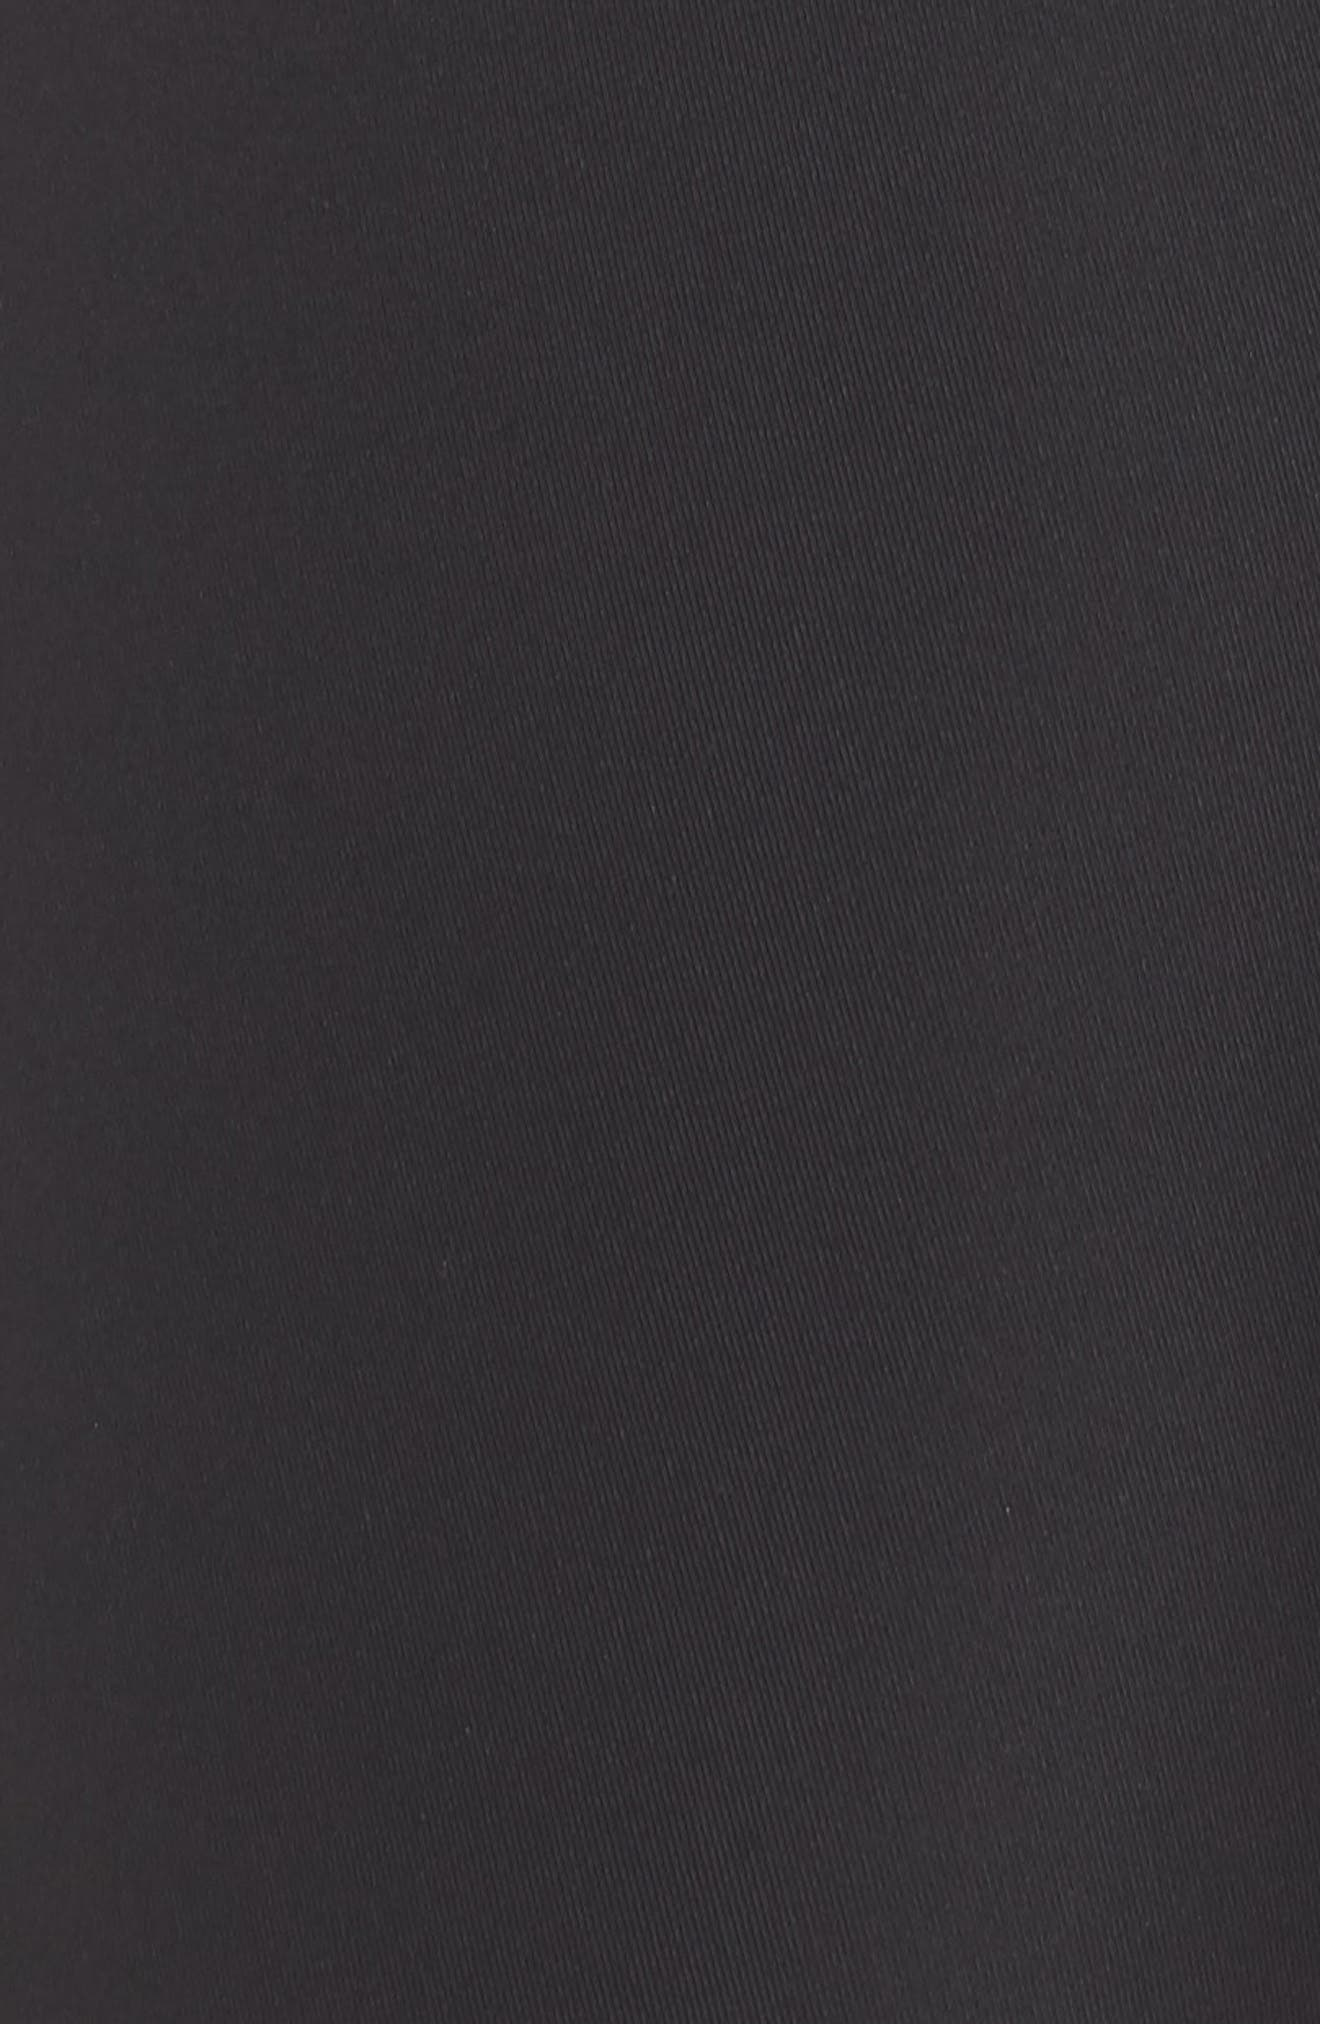 Constellation Print Crop Leggings,                             Alternate thumbnail 6, color,                             BLACK DESERT PEARL PRINT